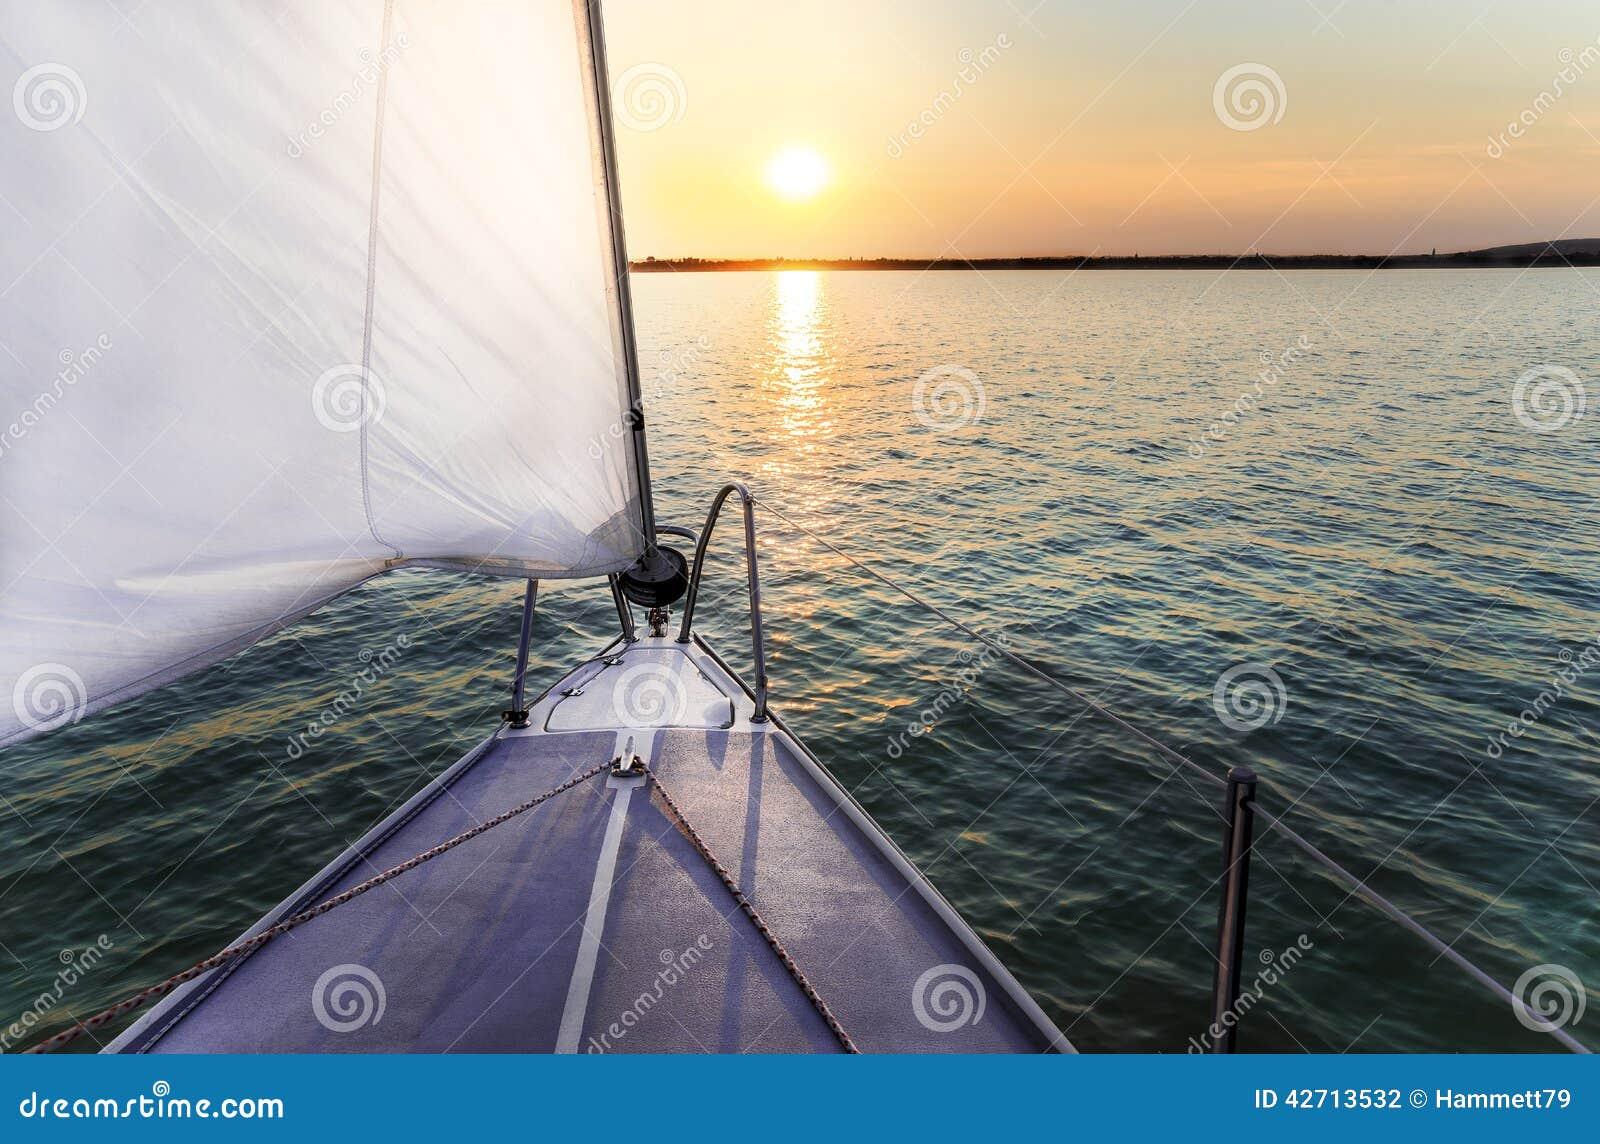 sunset sailing boats rocks - photo #24